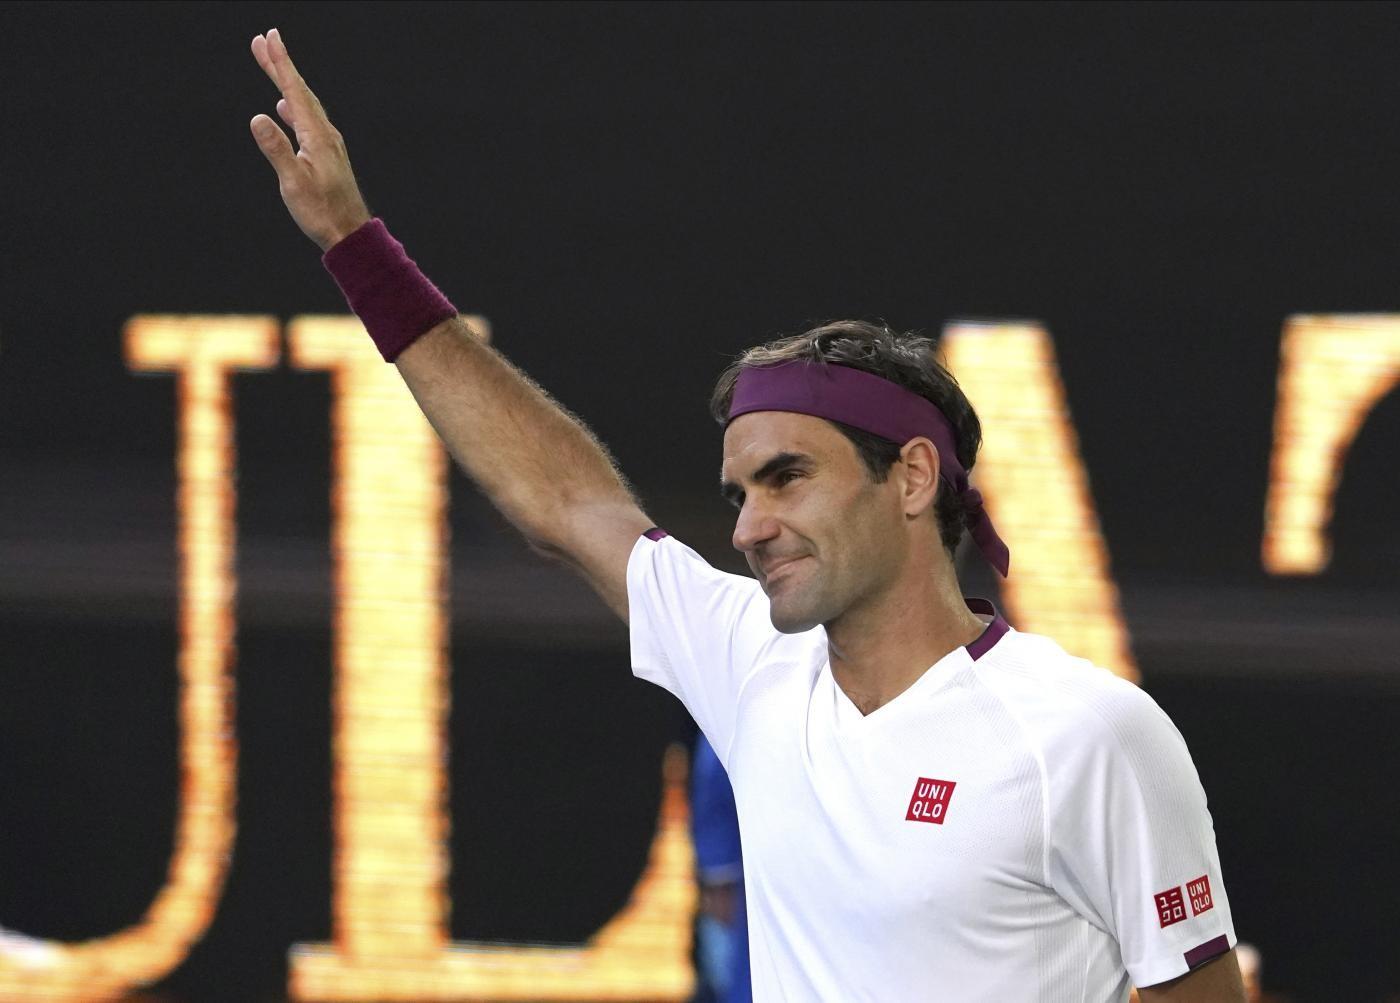 Roger Federer operato al ginocchio: tornerà per Wimbledon